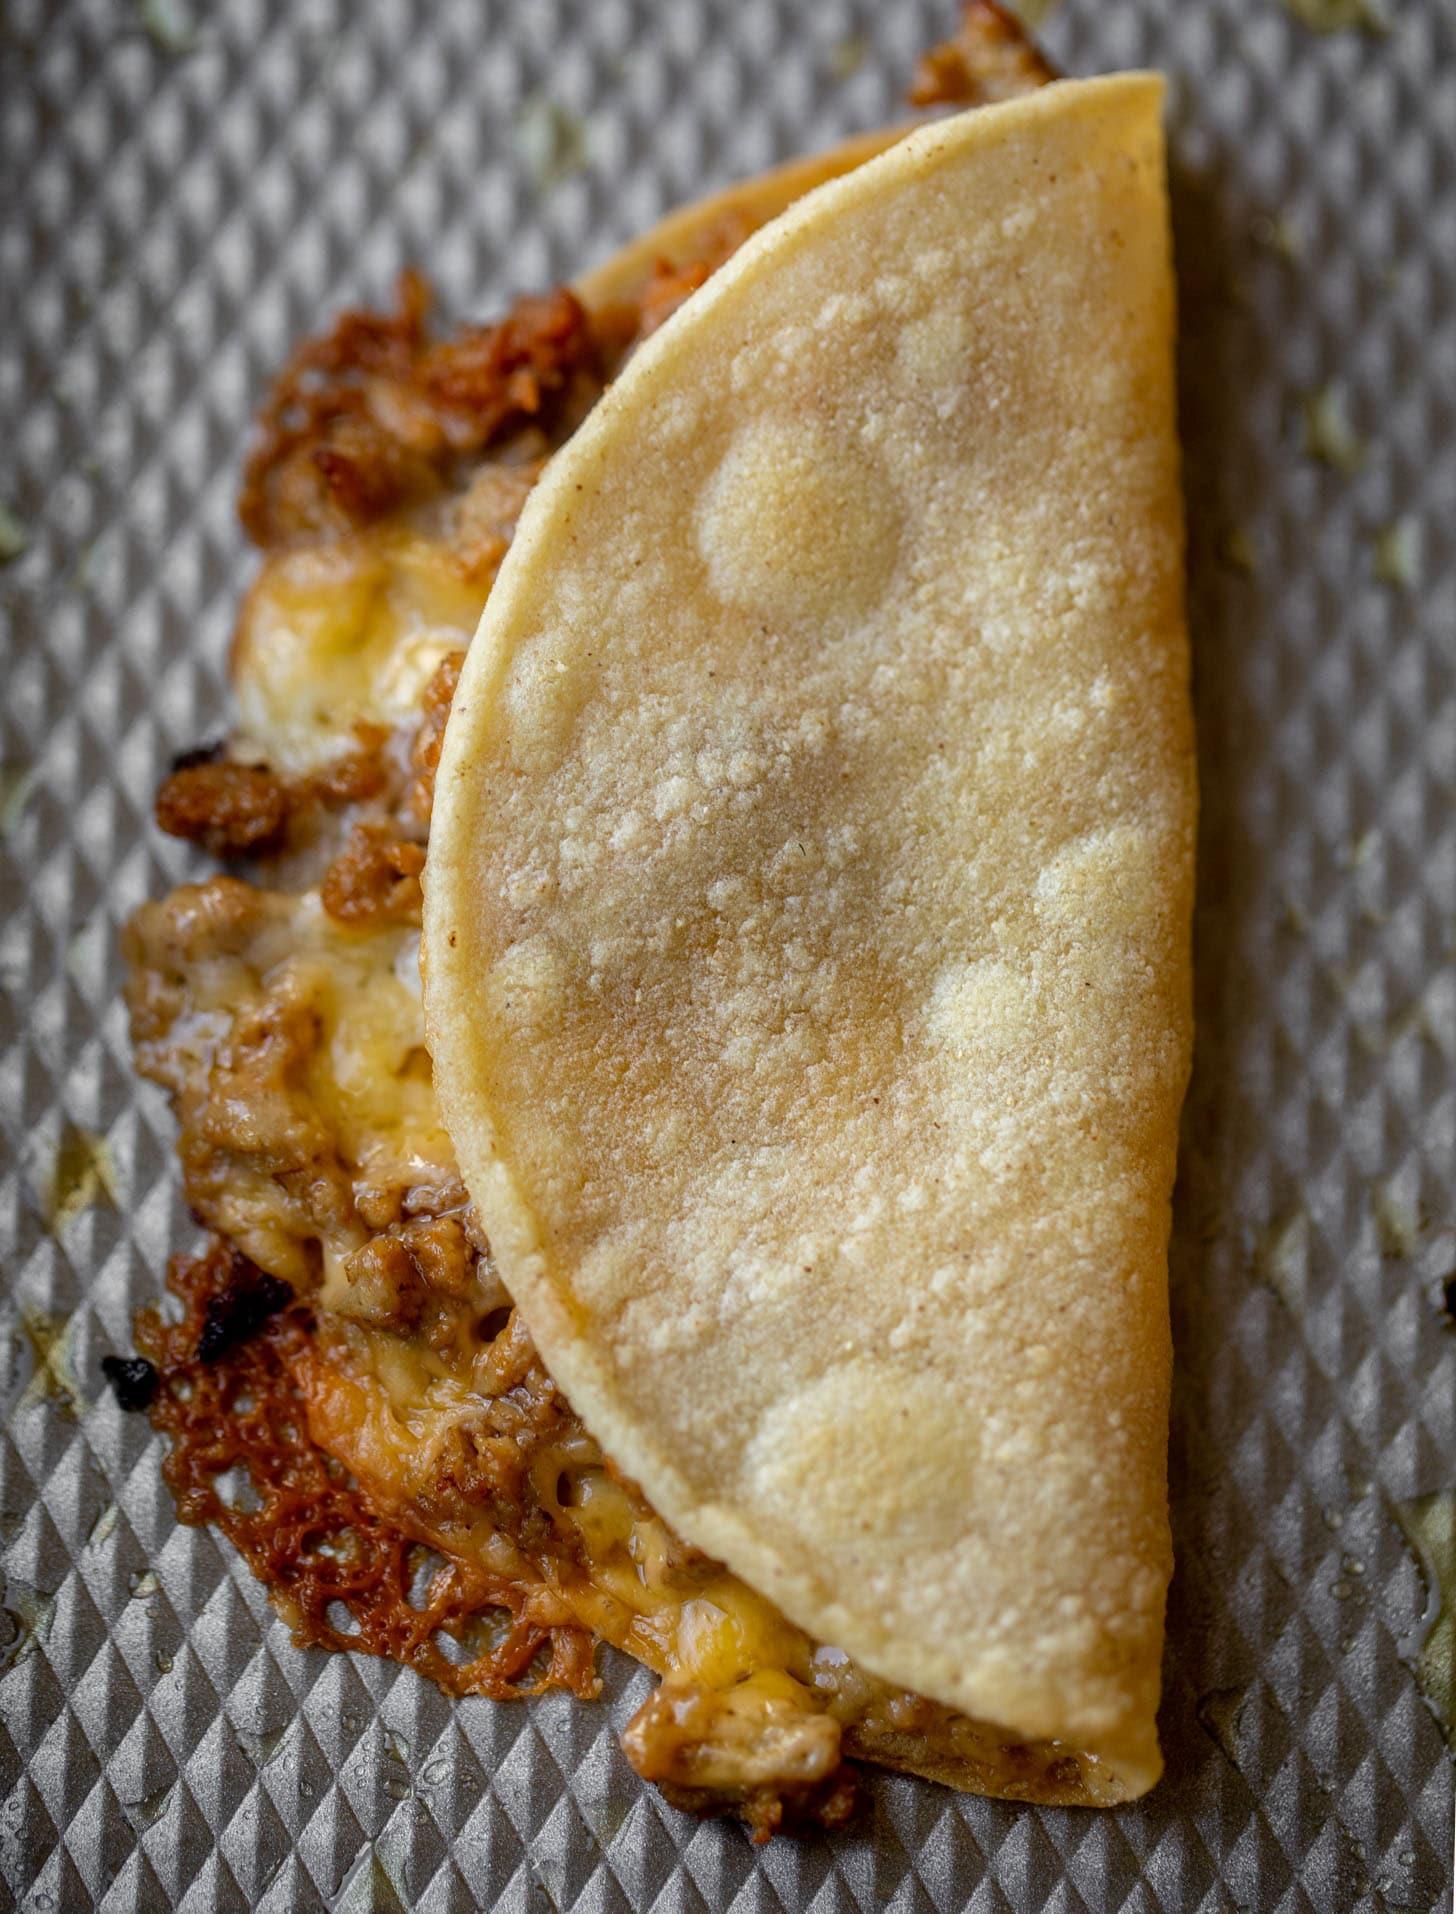 baked burger tortilla on a sheet pan